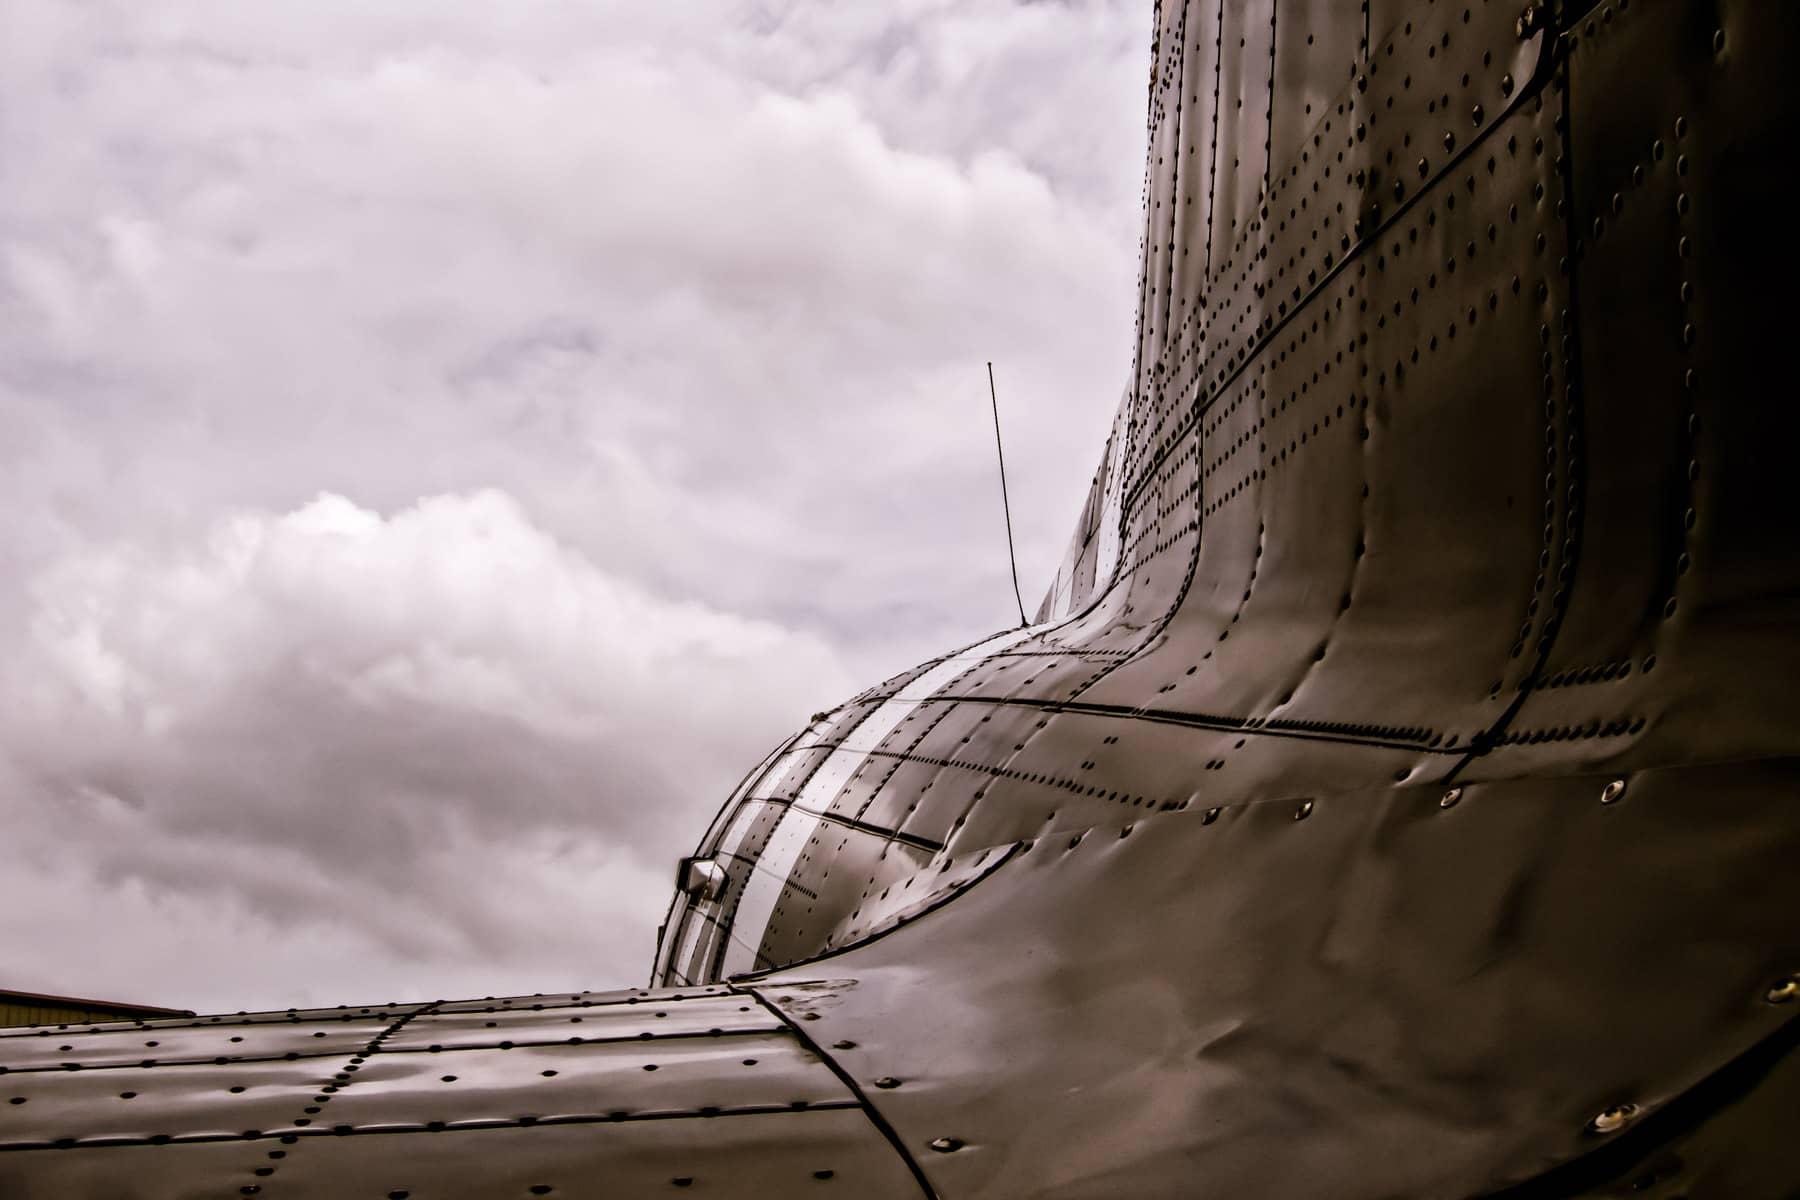 The fuselage of a Douglas C-47 Skytrain at the Cavanaugh Flight Museum, Addison, Texas.